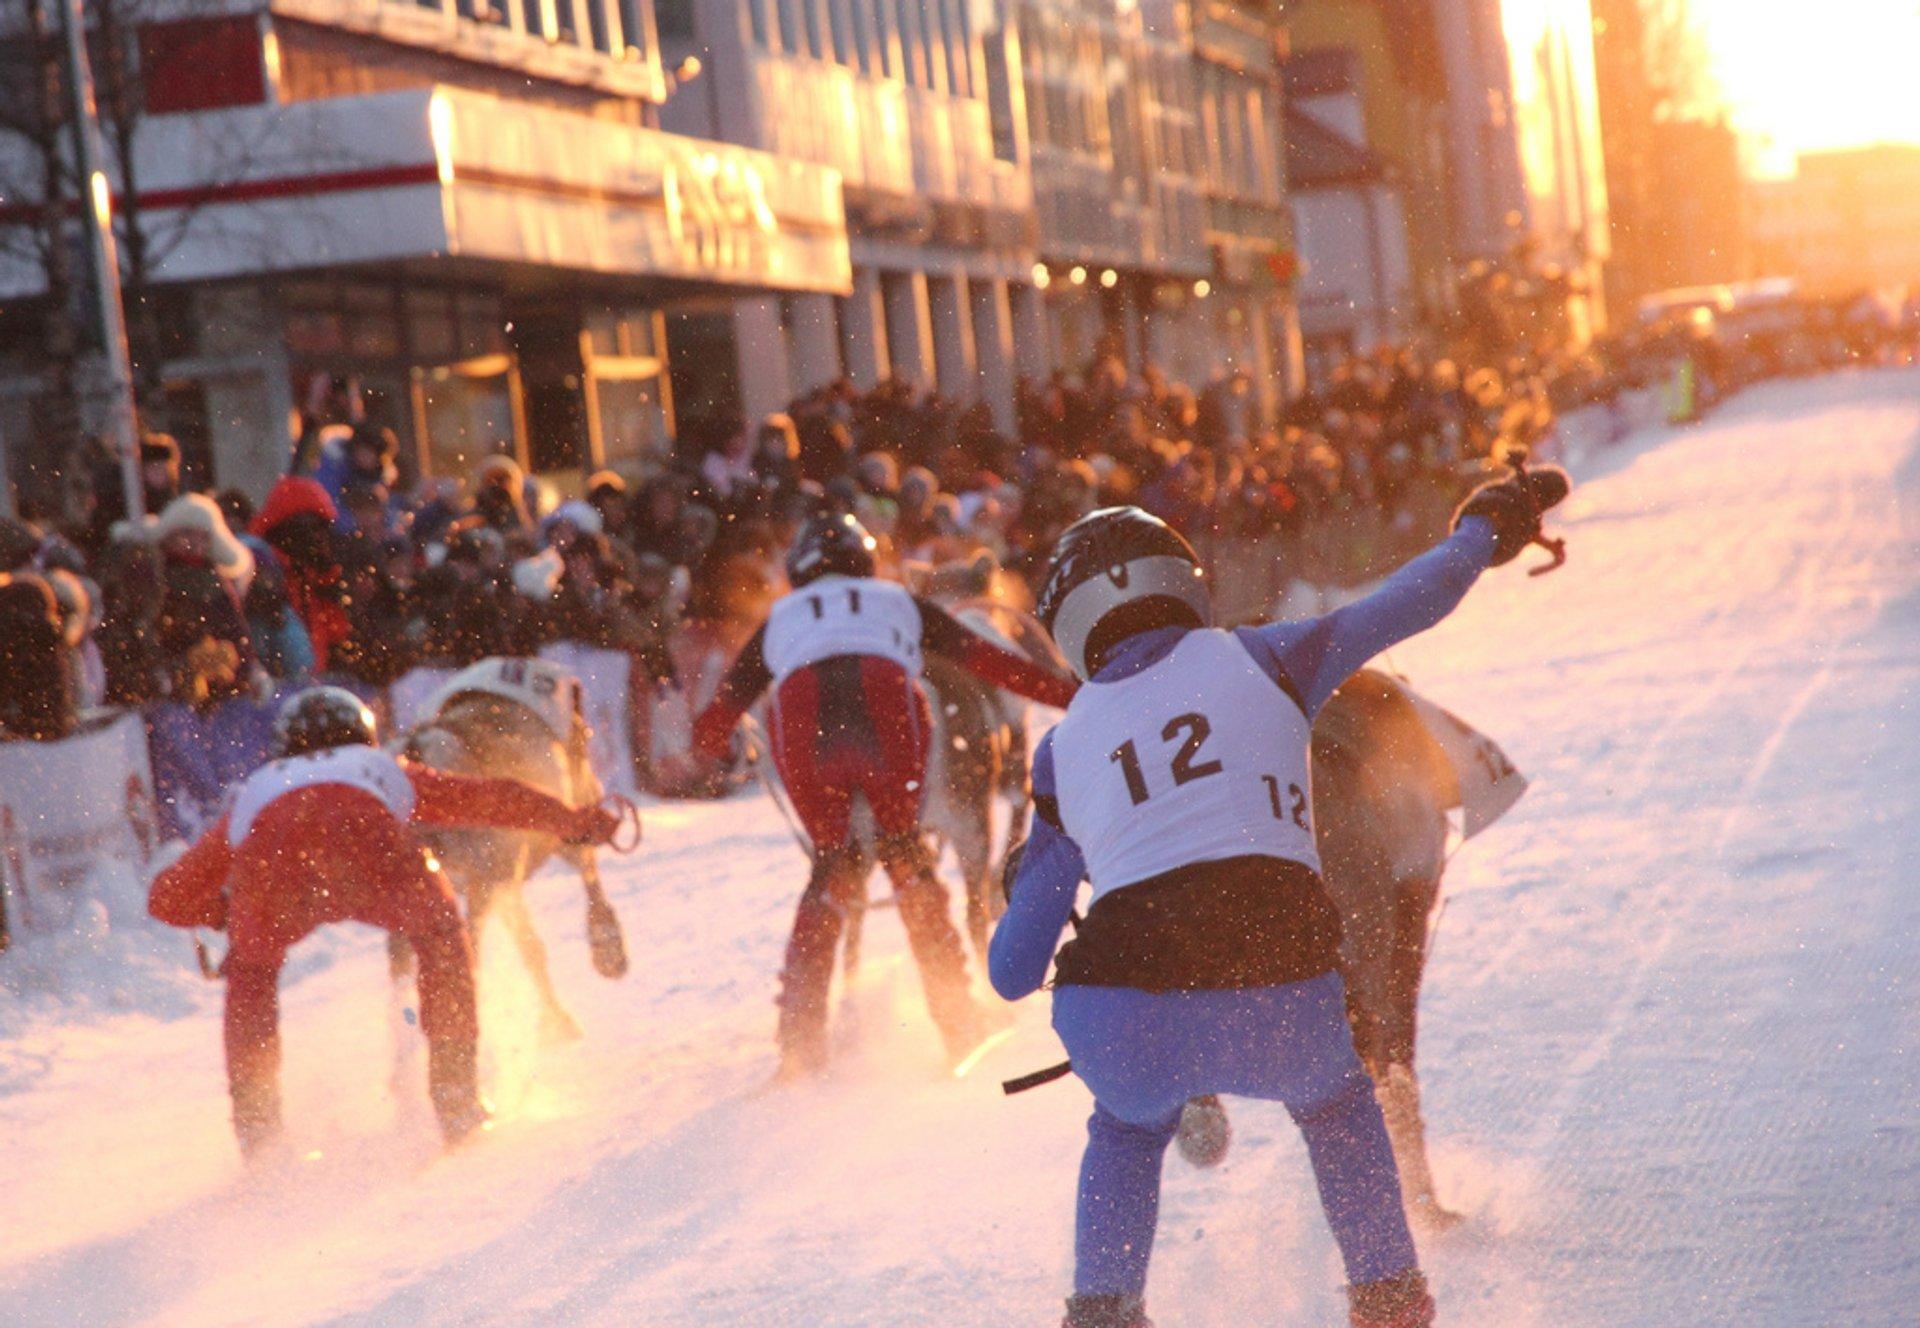 World Reindeer Racing Championships in Norway - Best Season 2019